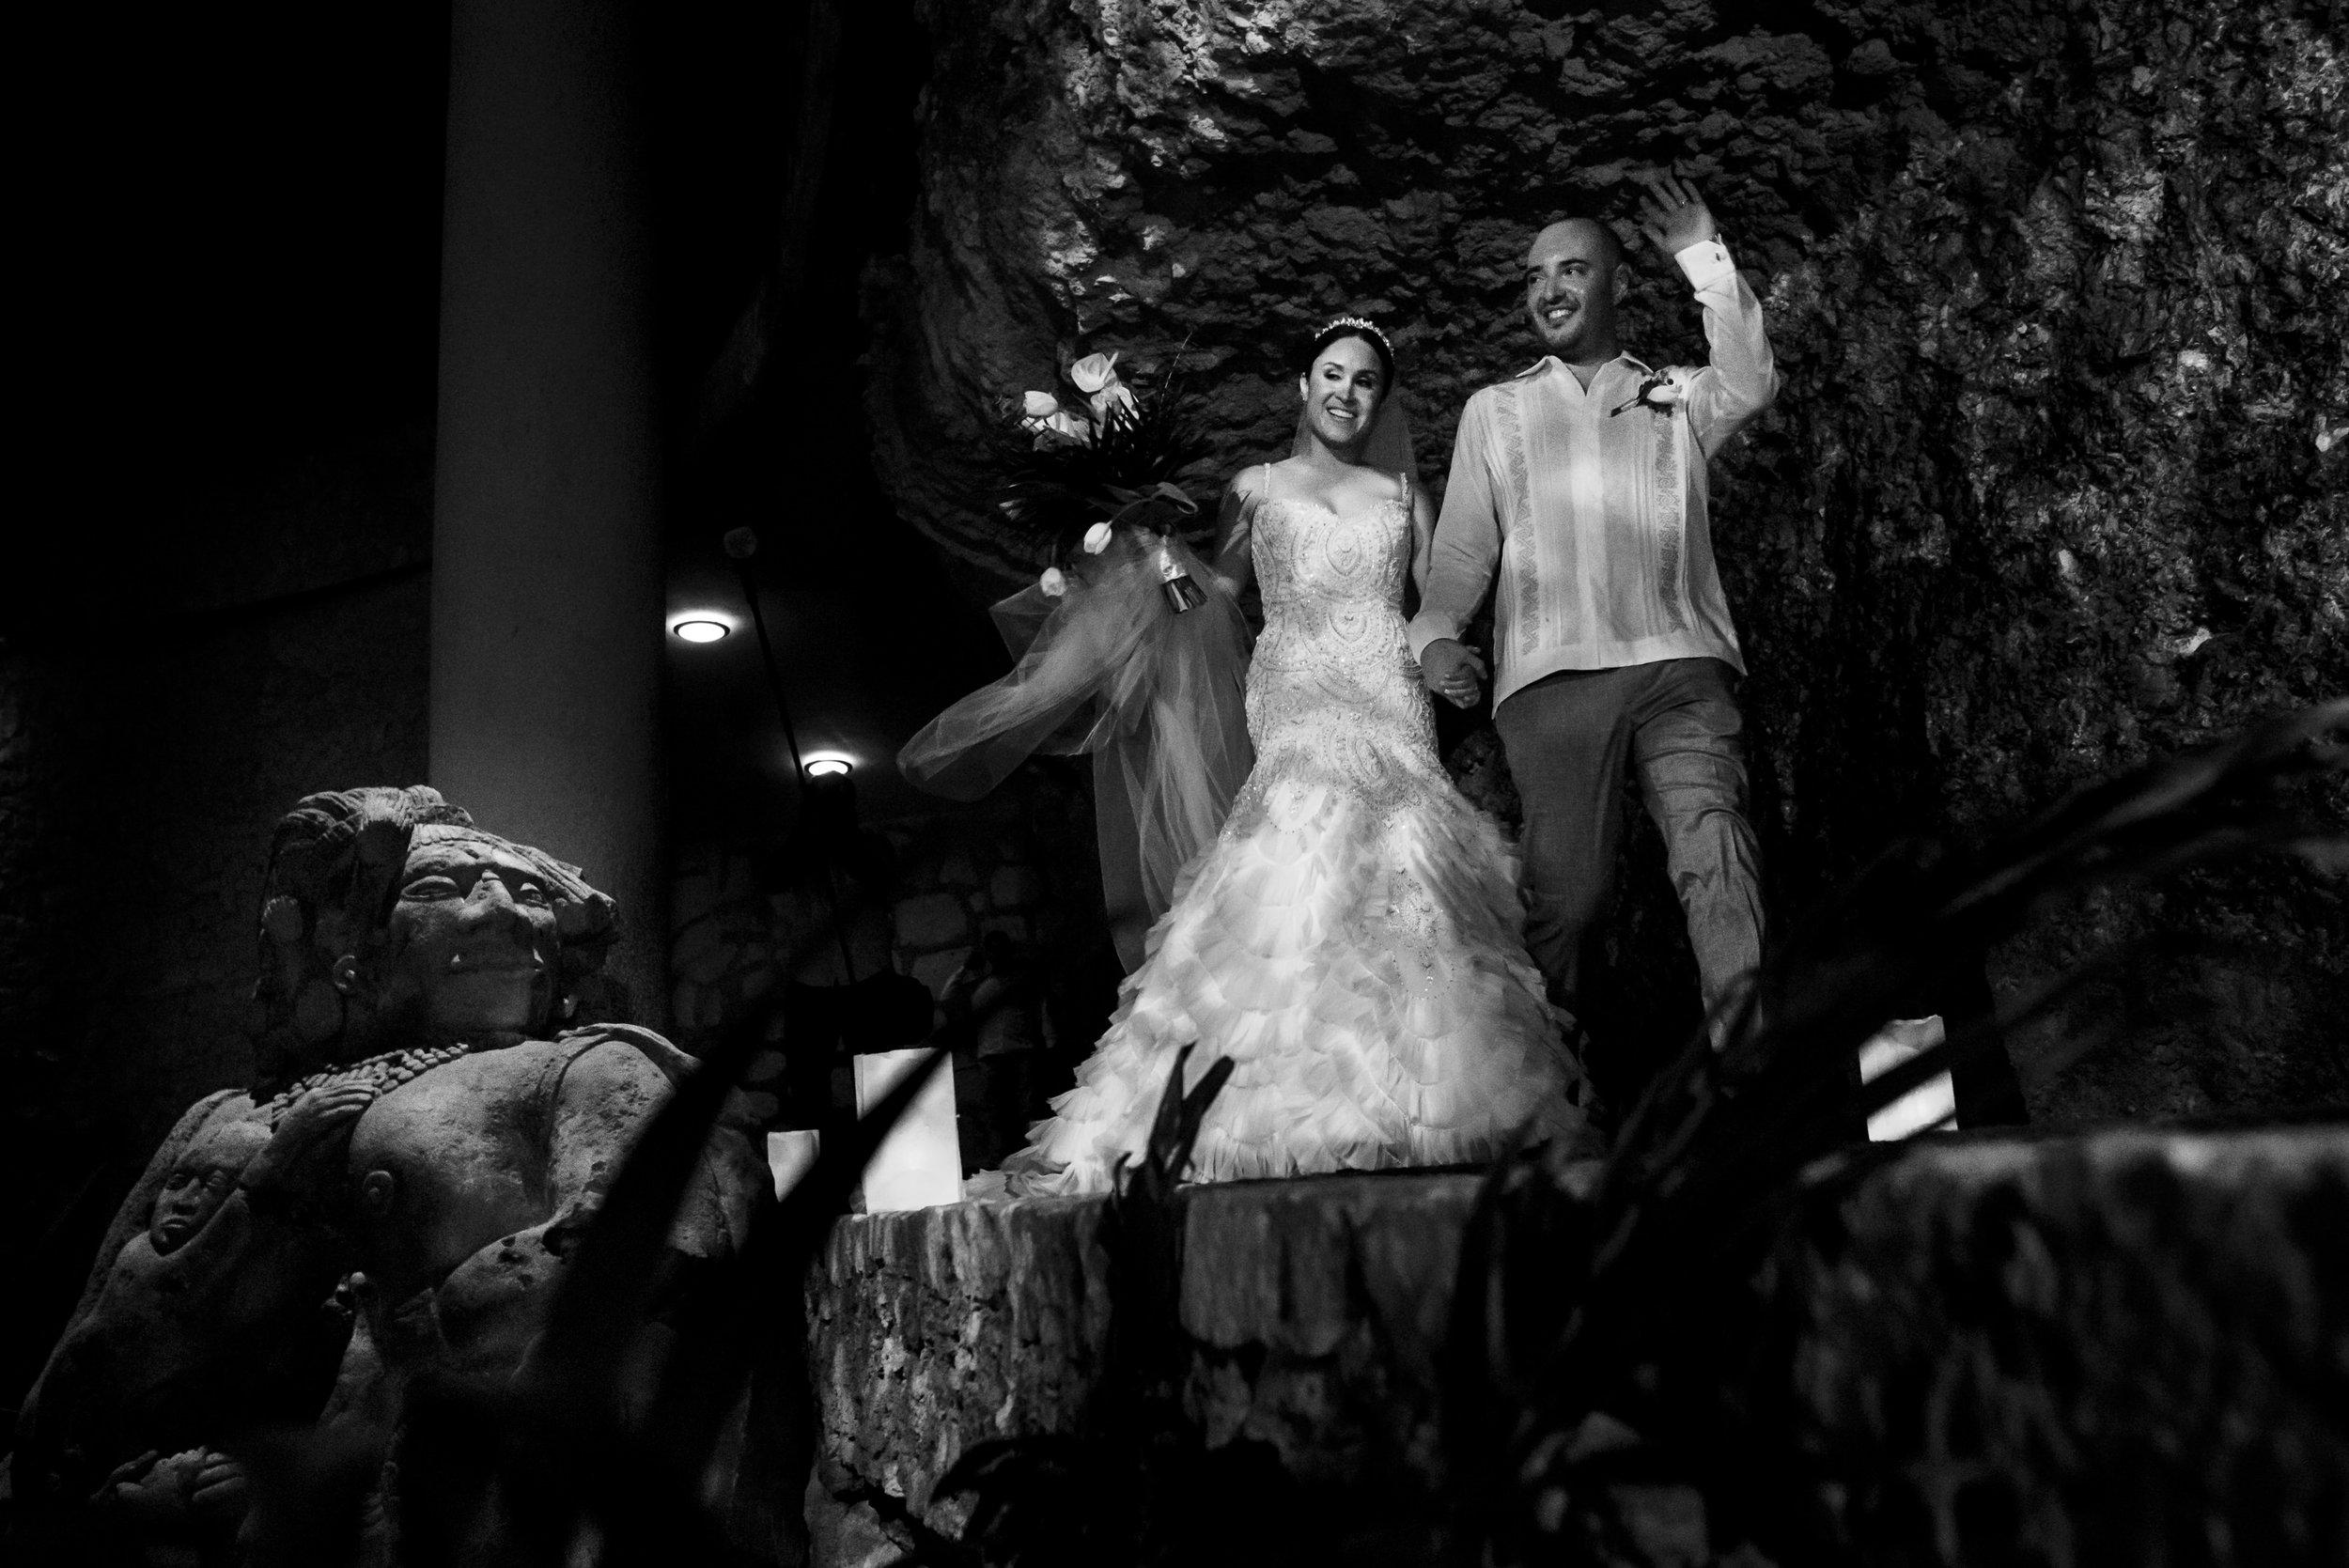 cancun_wedding_photographer_mexico (75).jpg